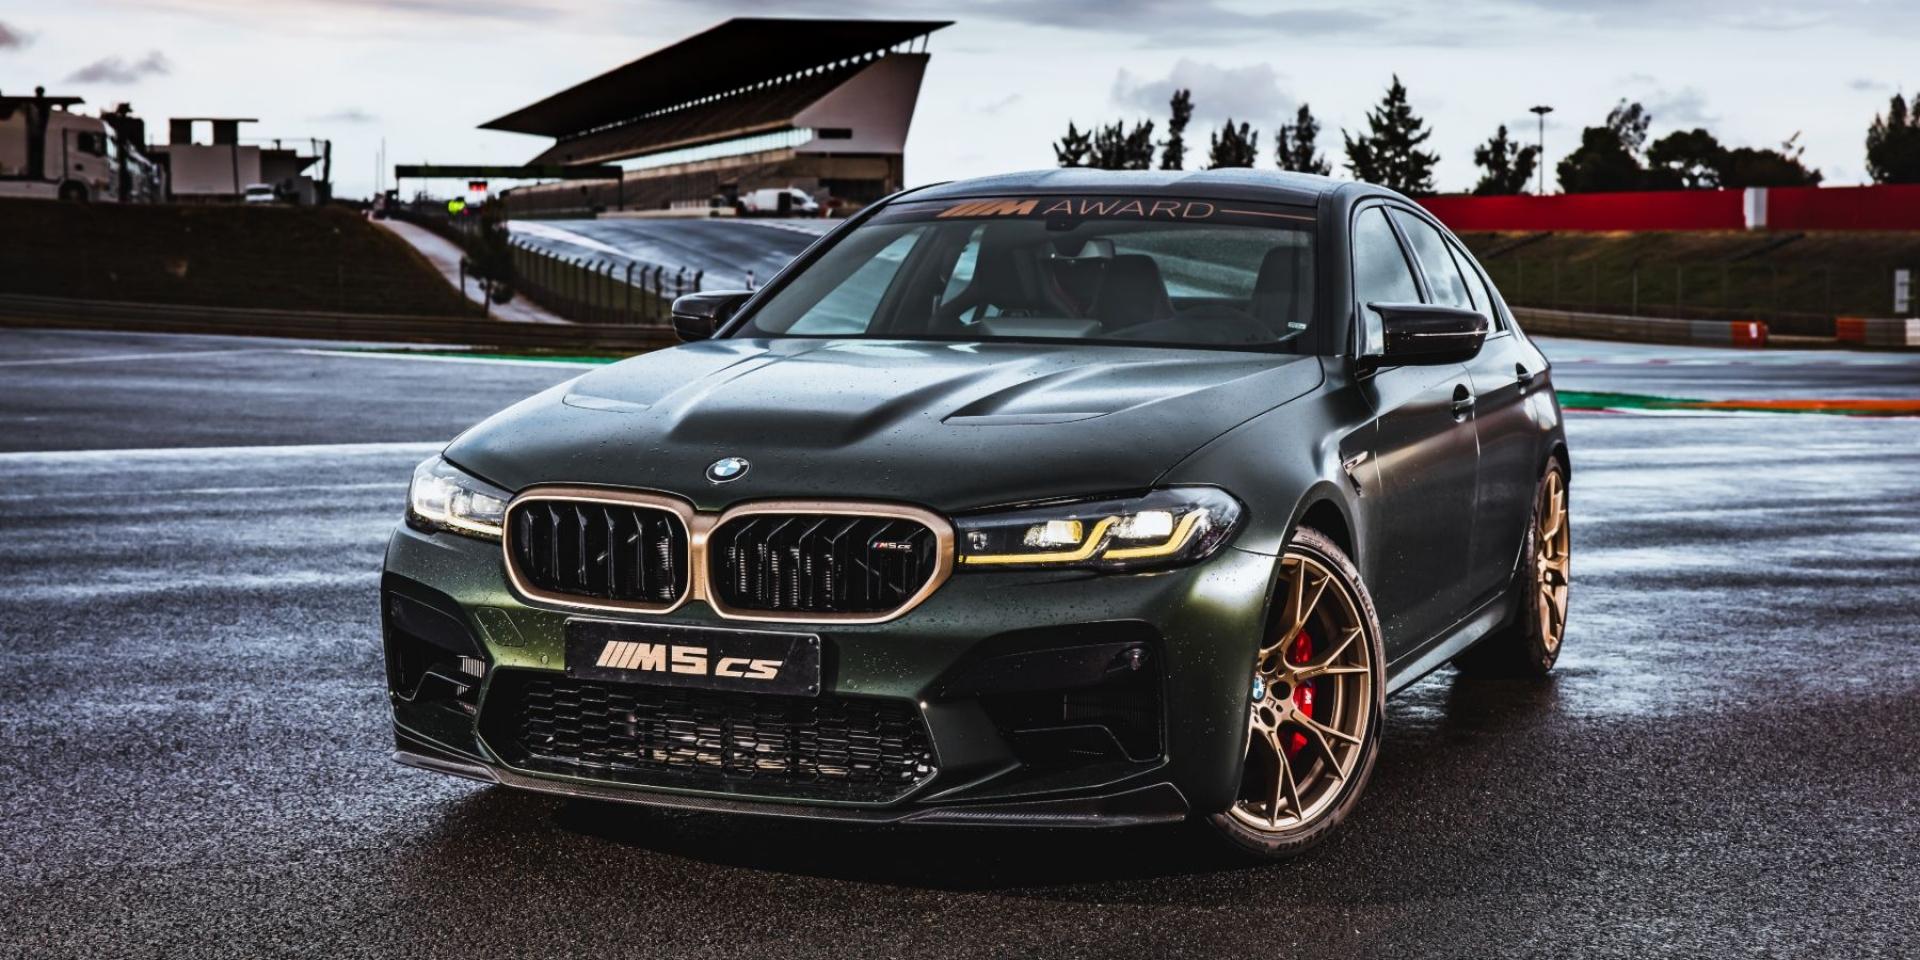 2021 MotoGP桿位王爭奪 贏家將獲得BMW M5 CS!